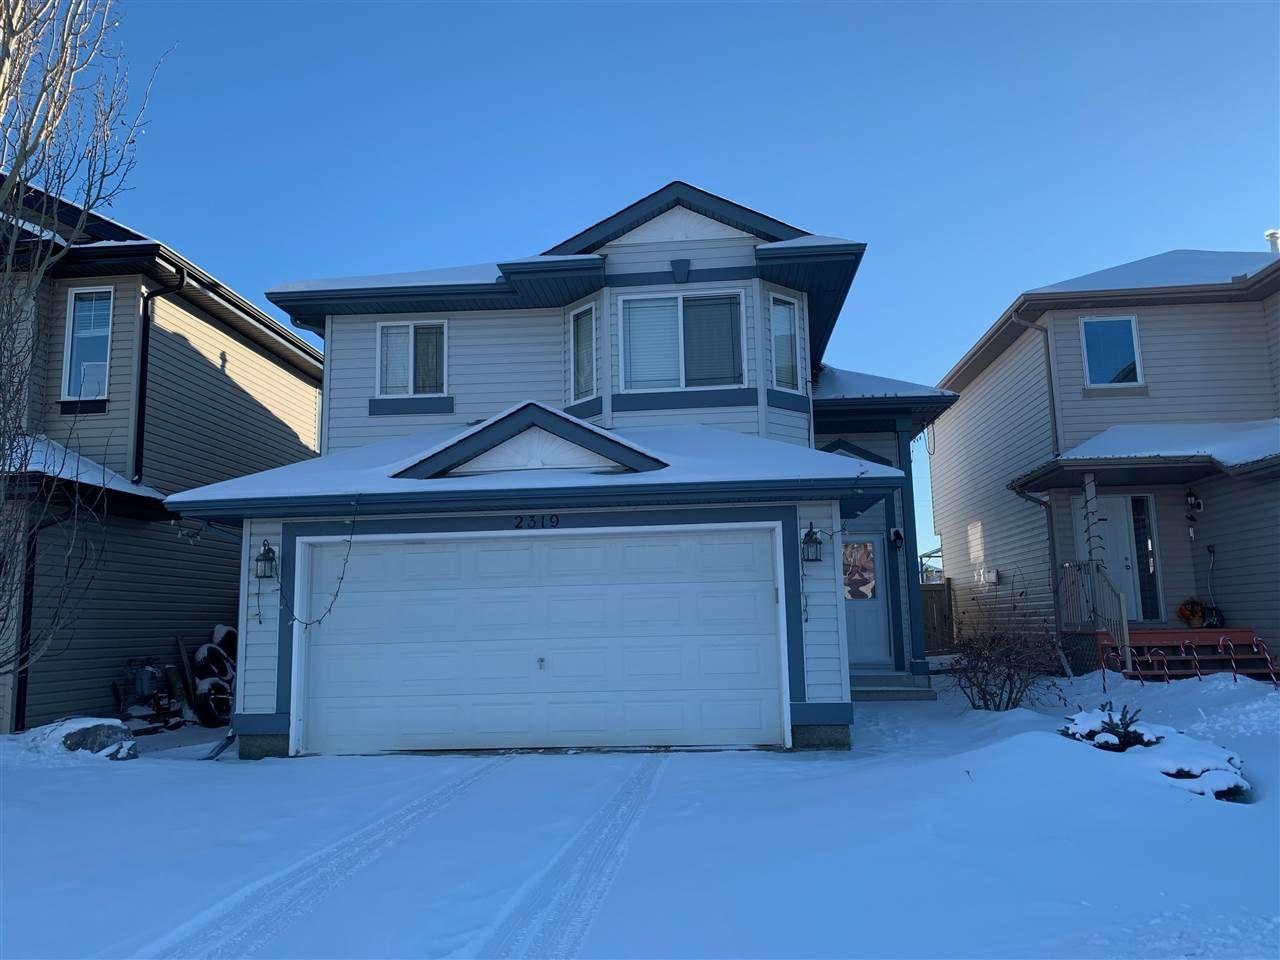 Main Photo: 2319 32 Avenue in Edmonton: Zone 30 House for sale : MLS®# E4230199